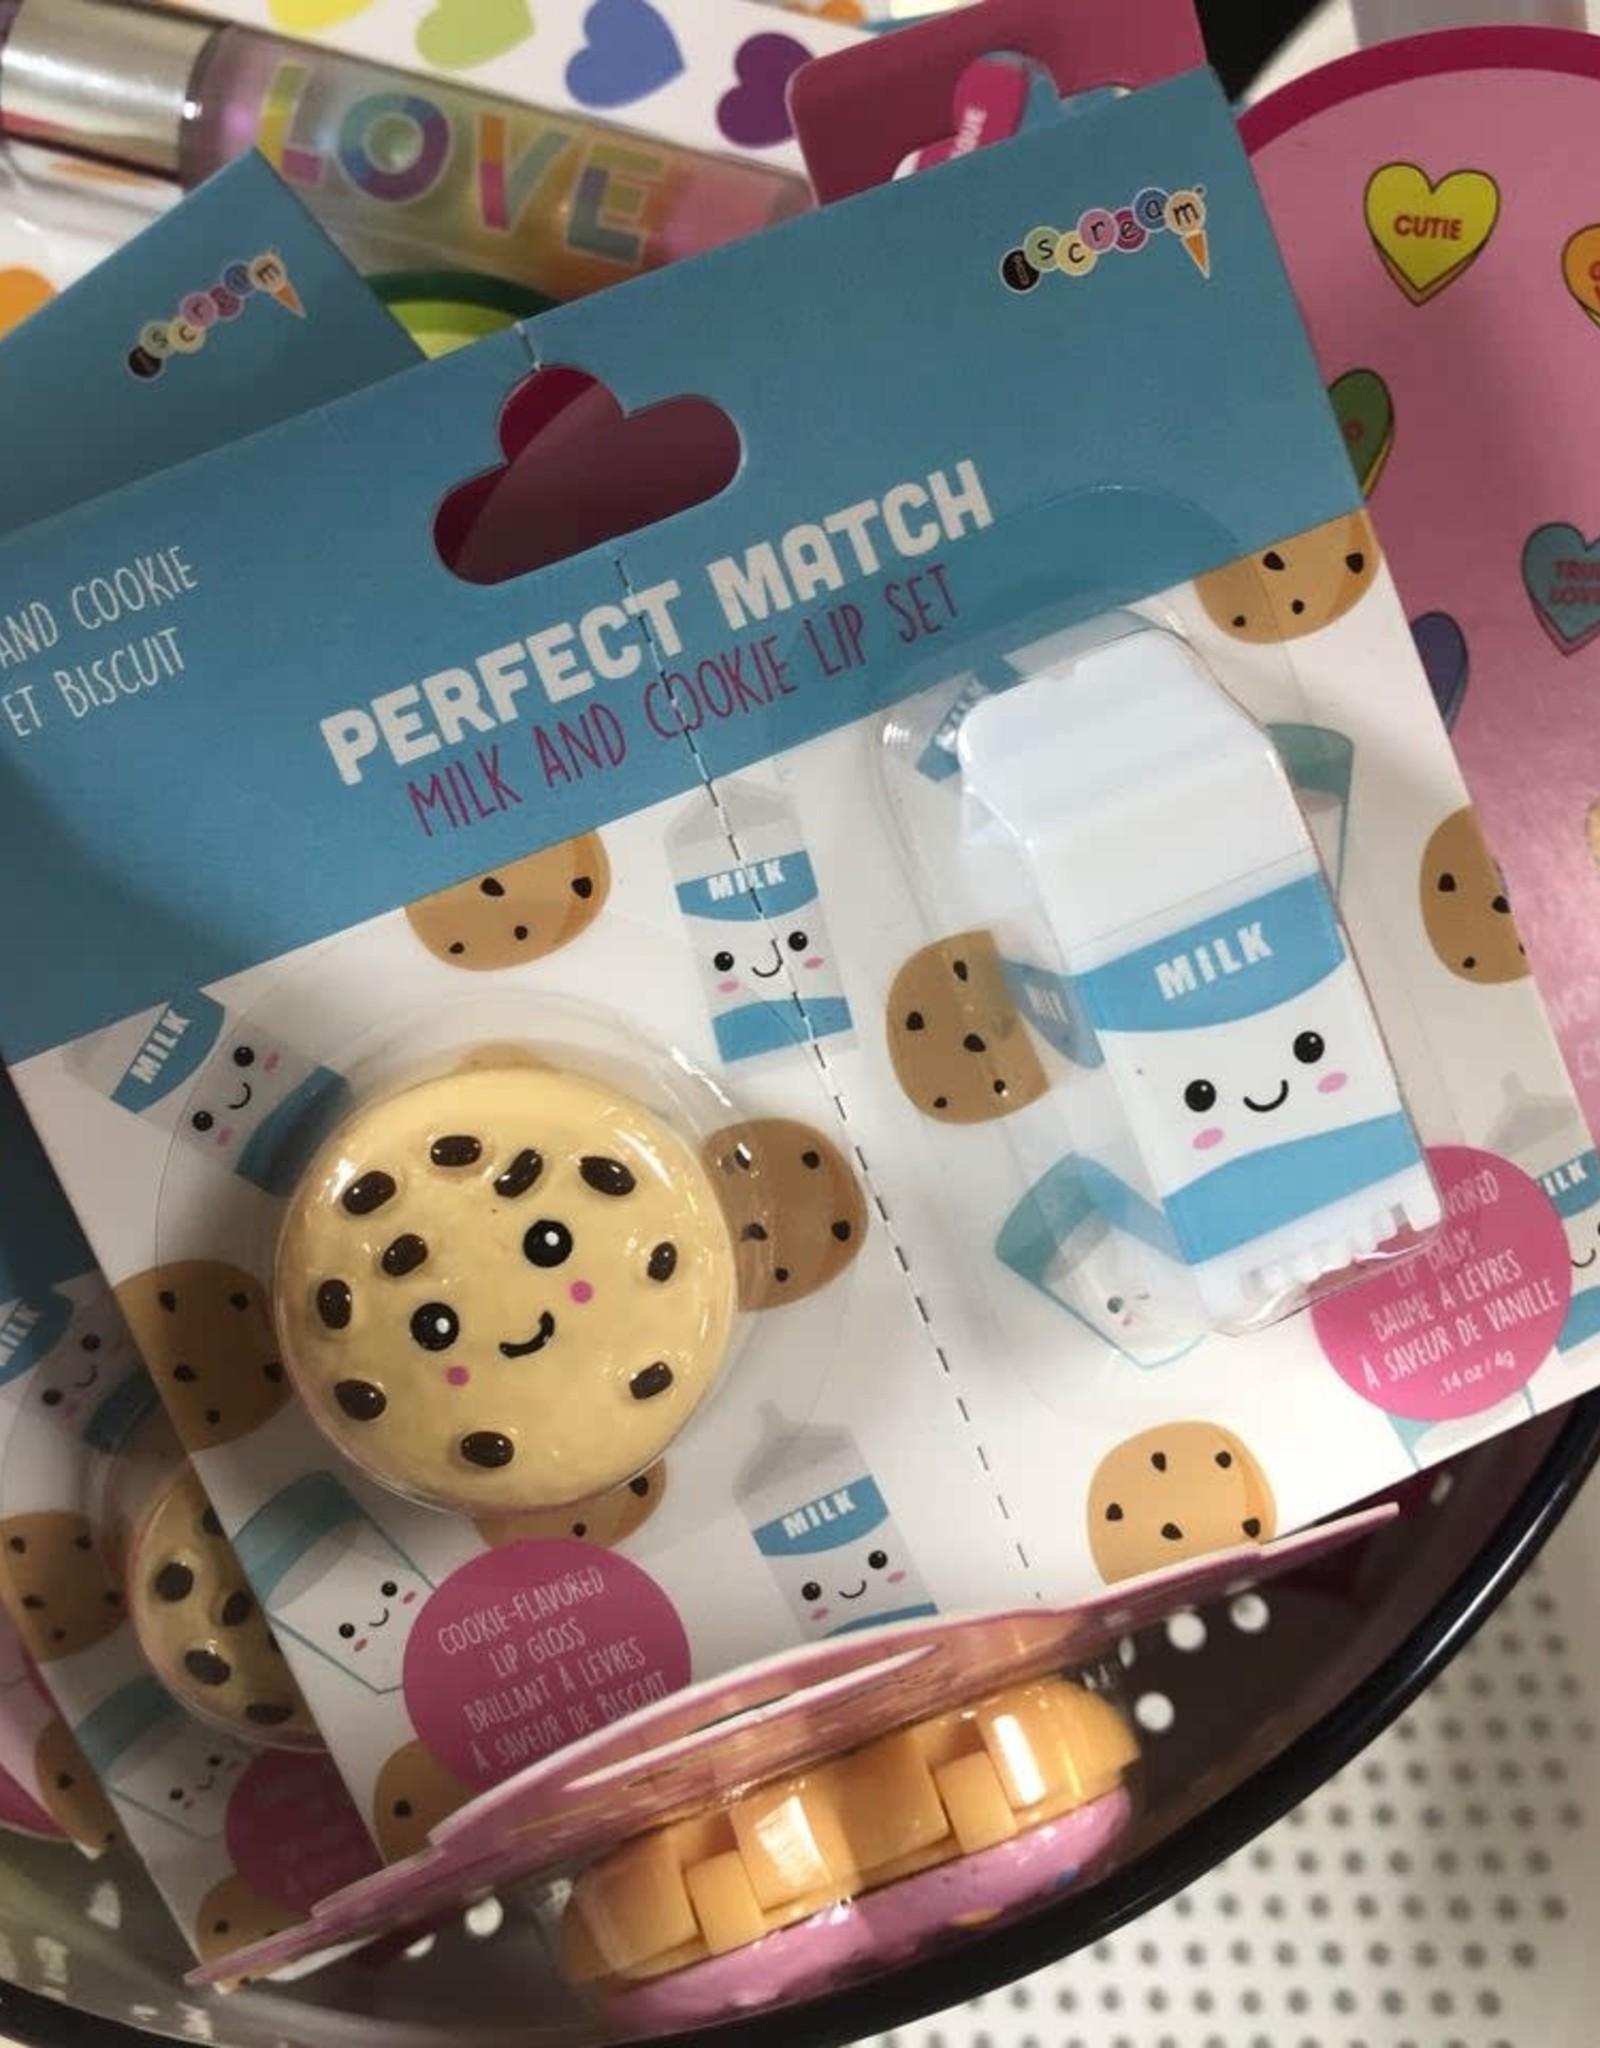 Iscream Cookies and Milk Lip Set